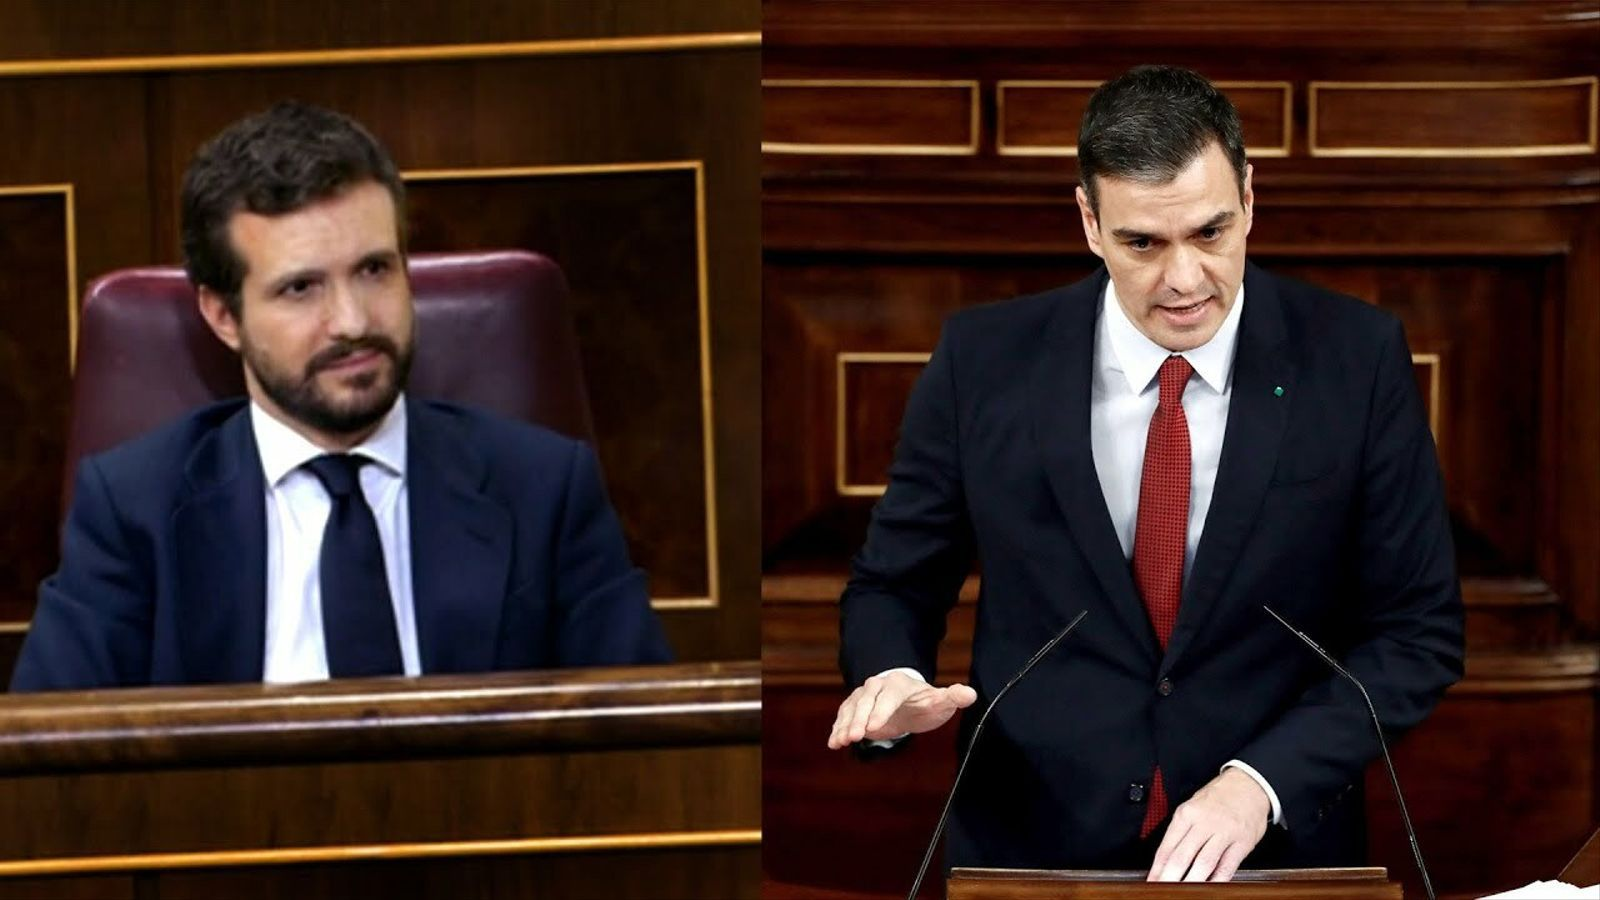 L'anàlisi d'Antoni Bassas: '«Autoridad competente»? Autoritat incompetent'